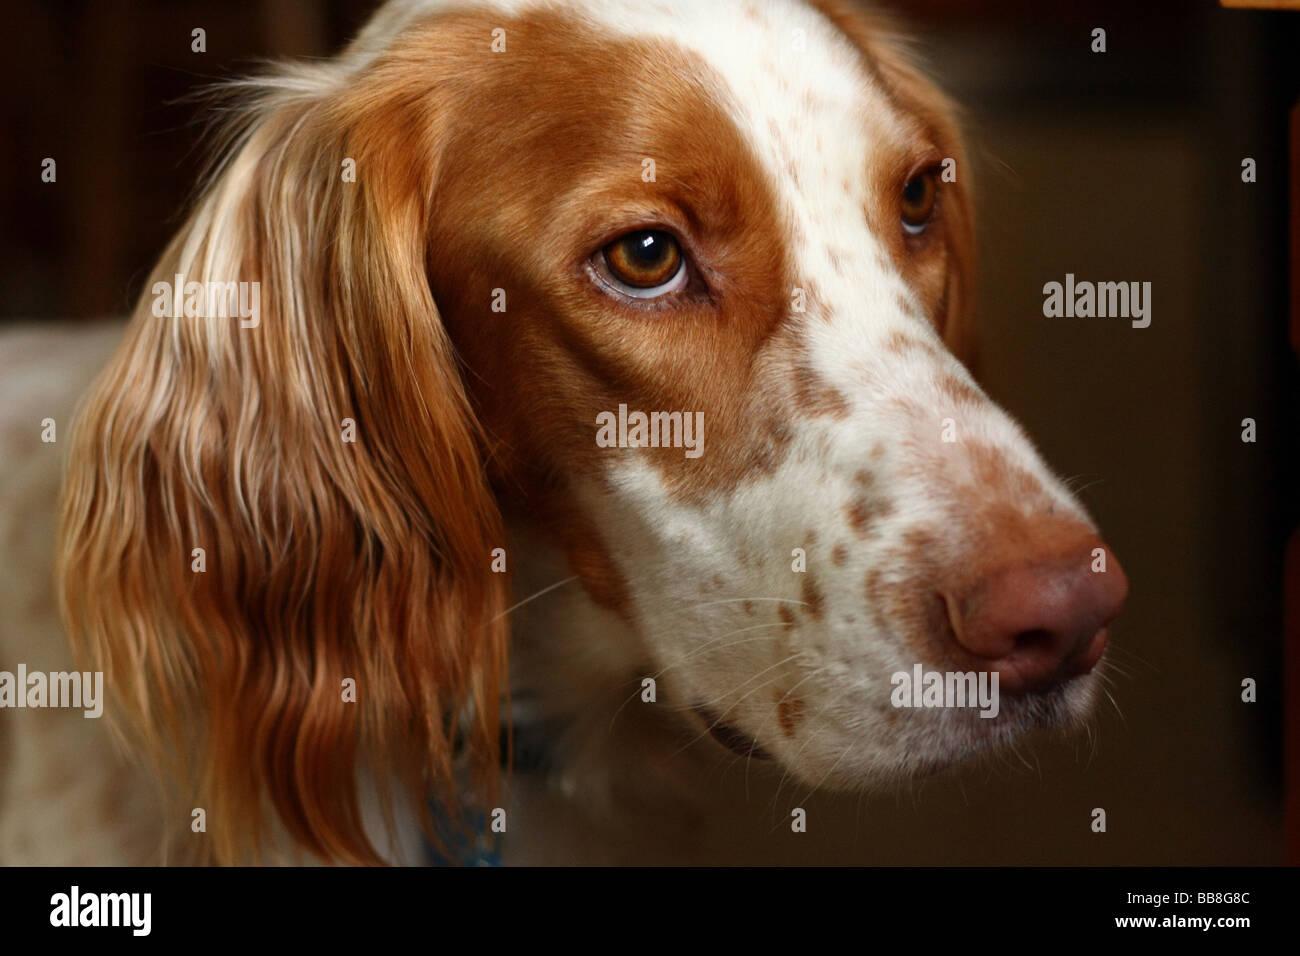 English Setter dog portrait by window light - Stock Image